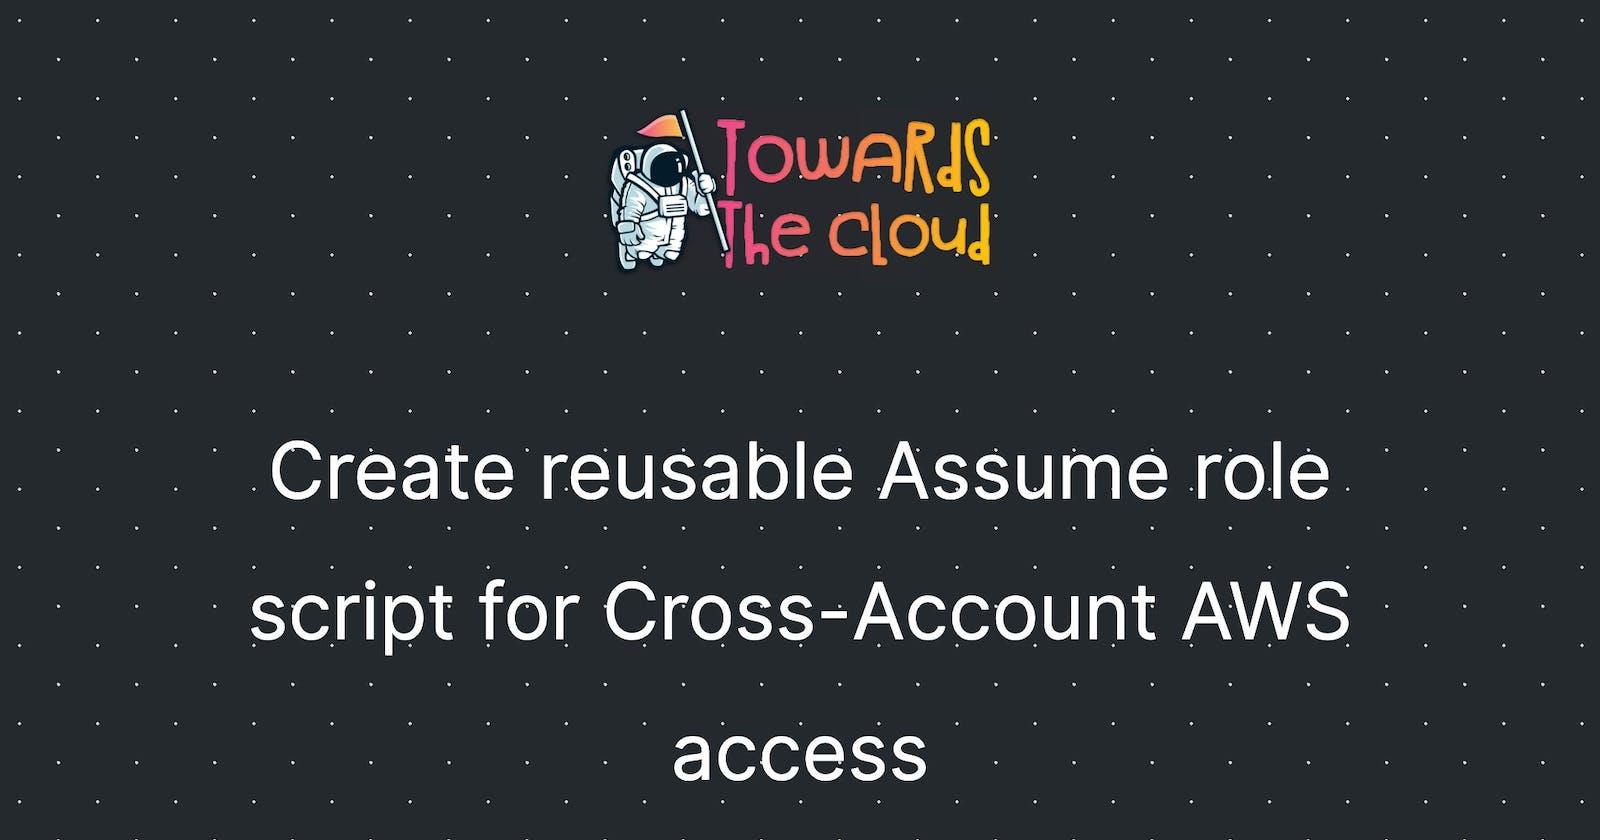 Create reusable Assume role script for Cross-Account AWS access